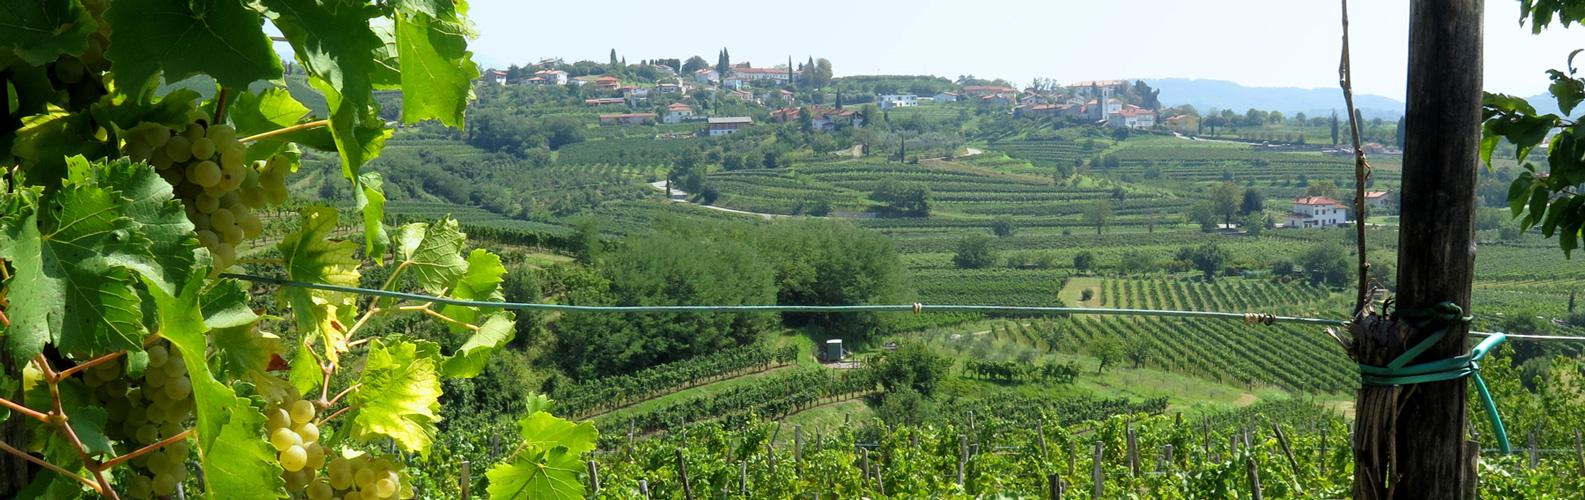 Brda wijnregio in Slovenië; bron Mijn Slovenie